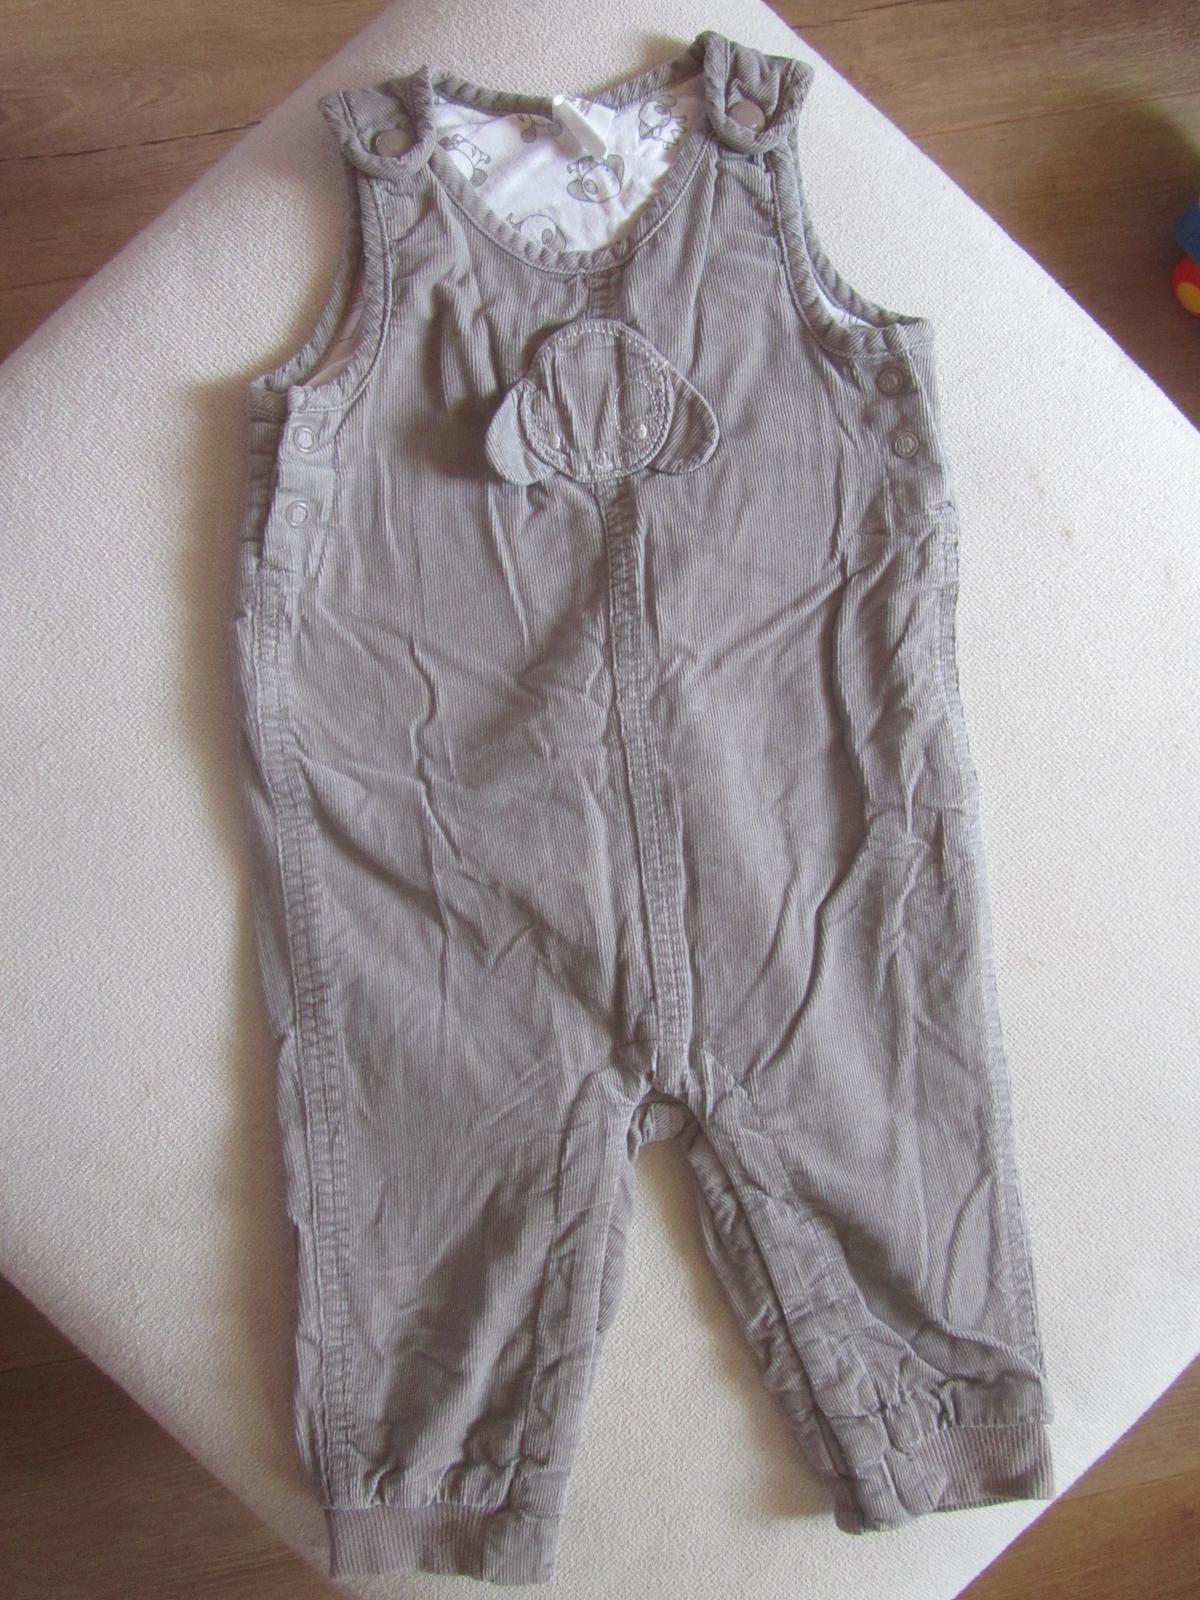 Zateplene mencestrove nohavice H&M 68 - Obrázok č. 1